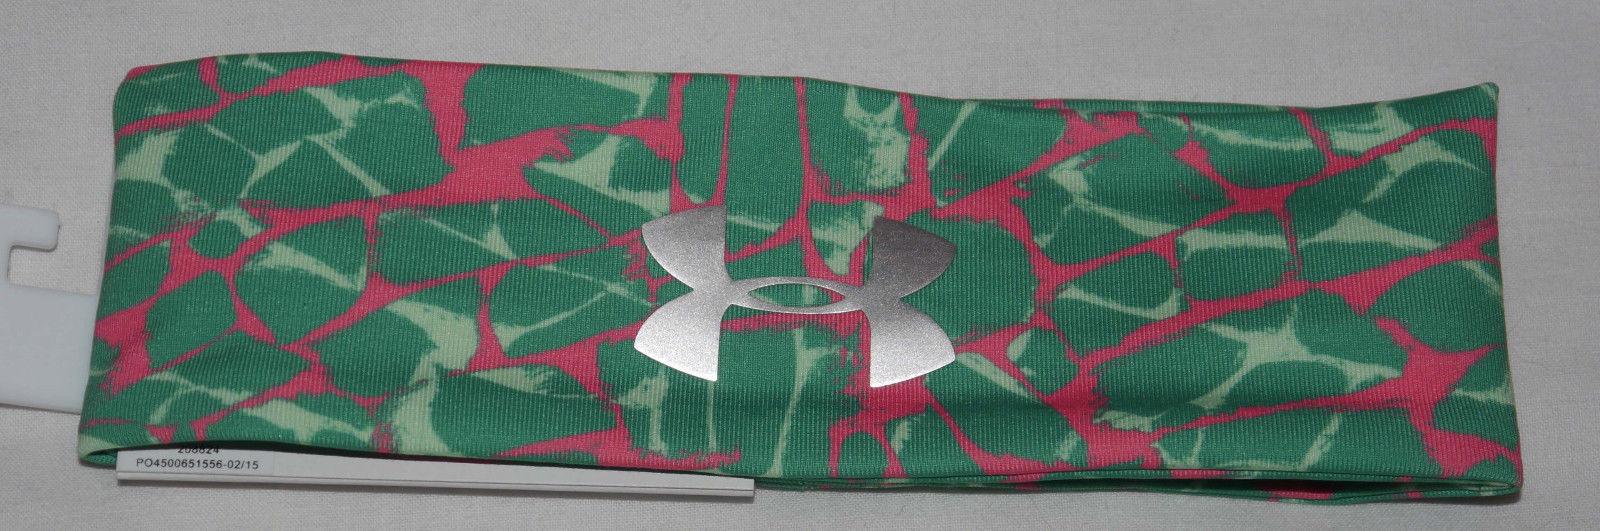 Under Armour Girl's Emerald Lake/Afterburn/Silver Metallic UA Print Headband 12550